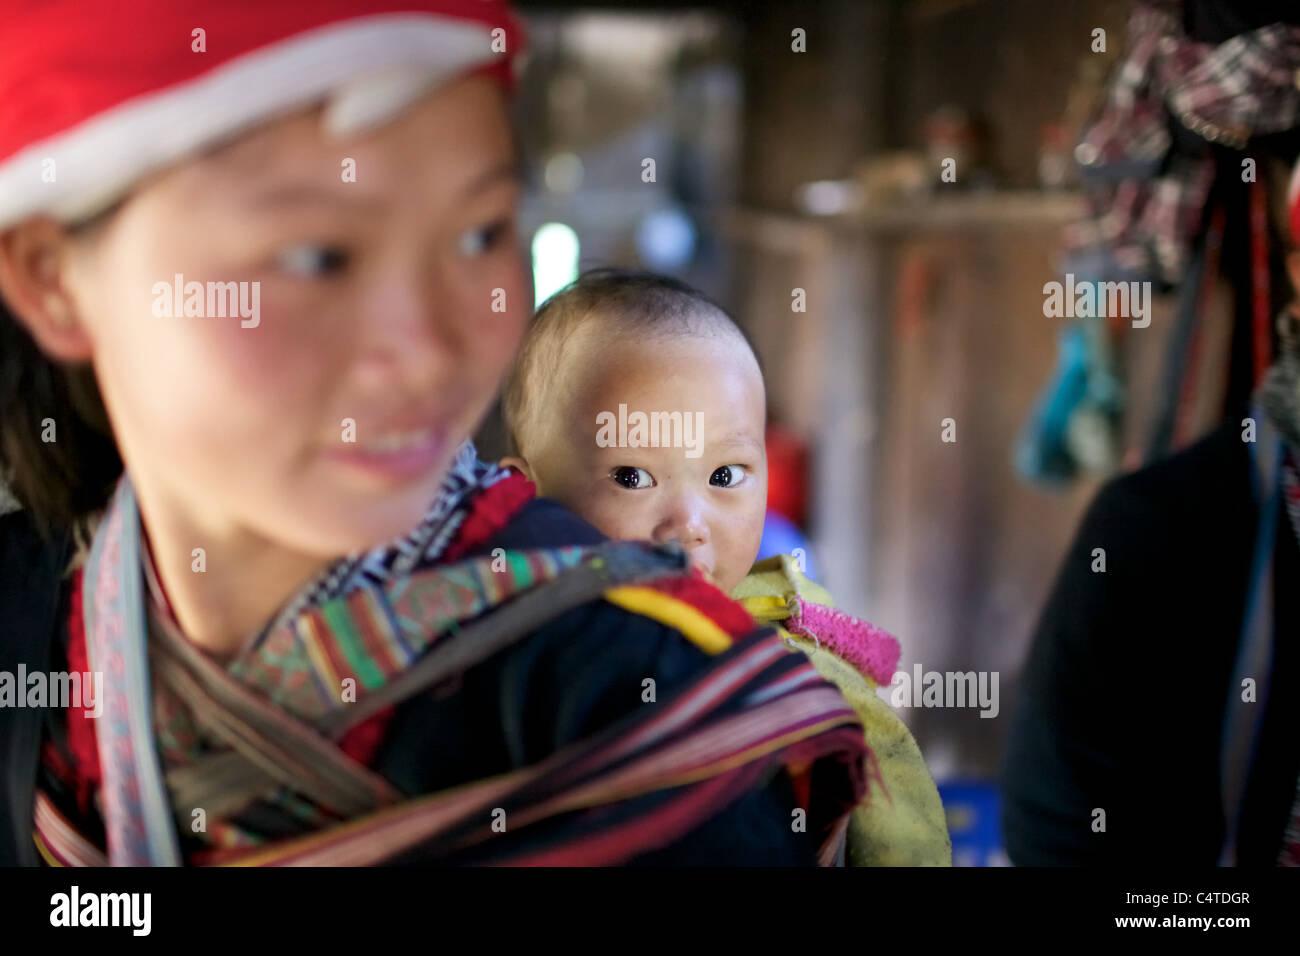 Red Dao Ethnic Minority People Vietnam - Stock Image